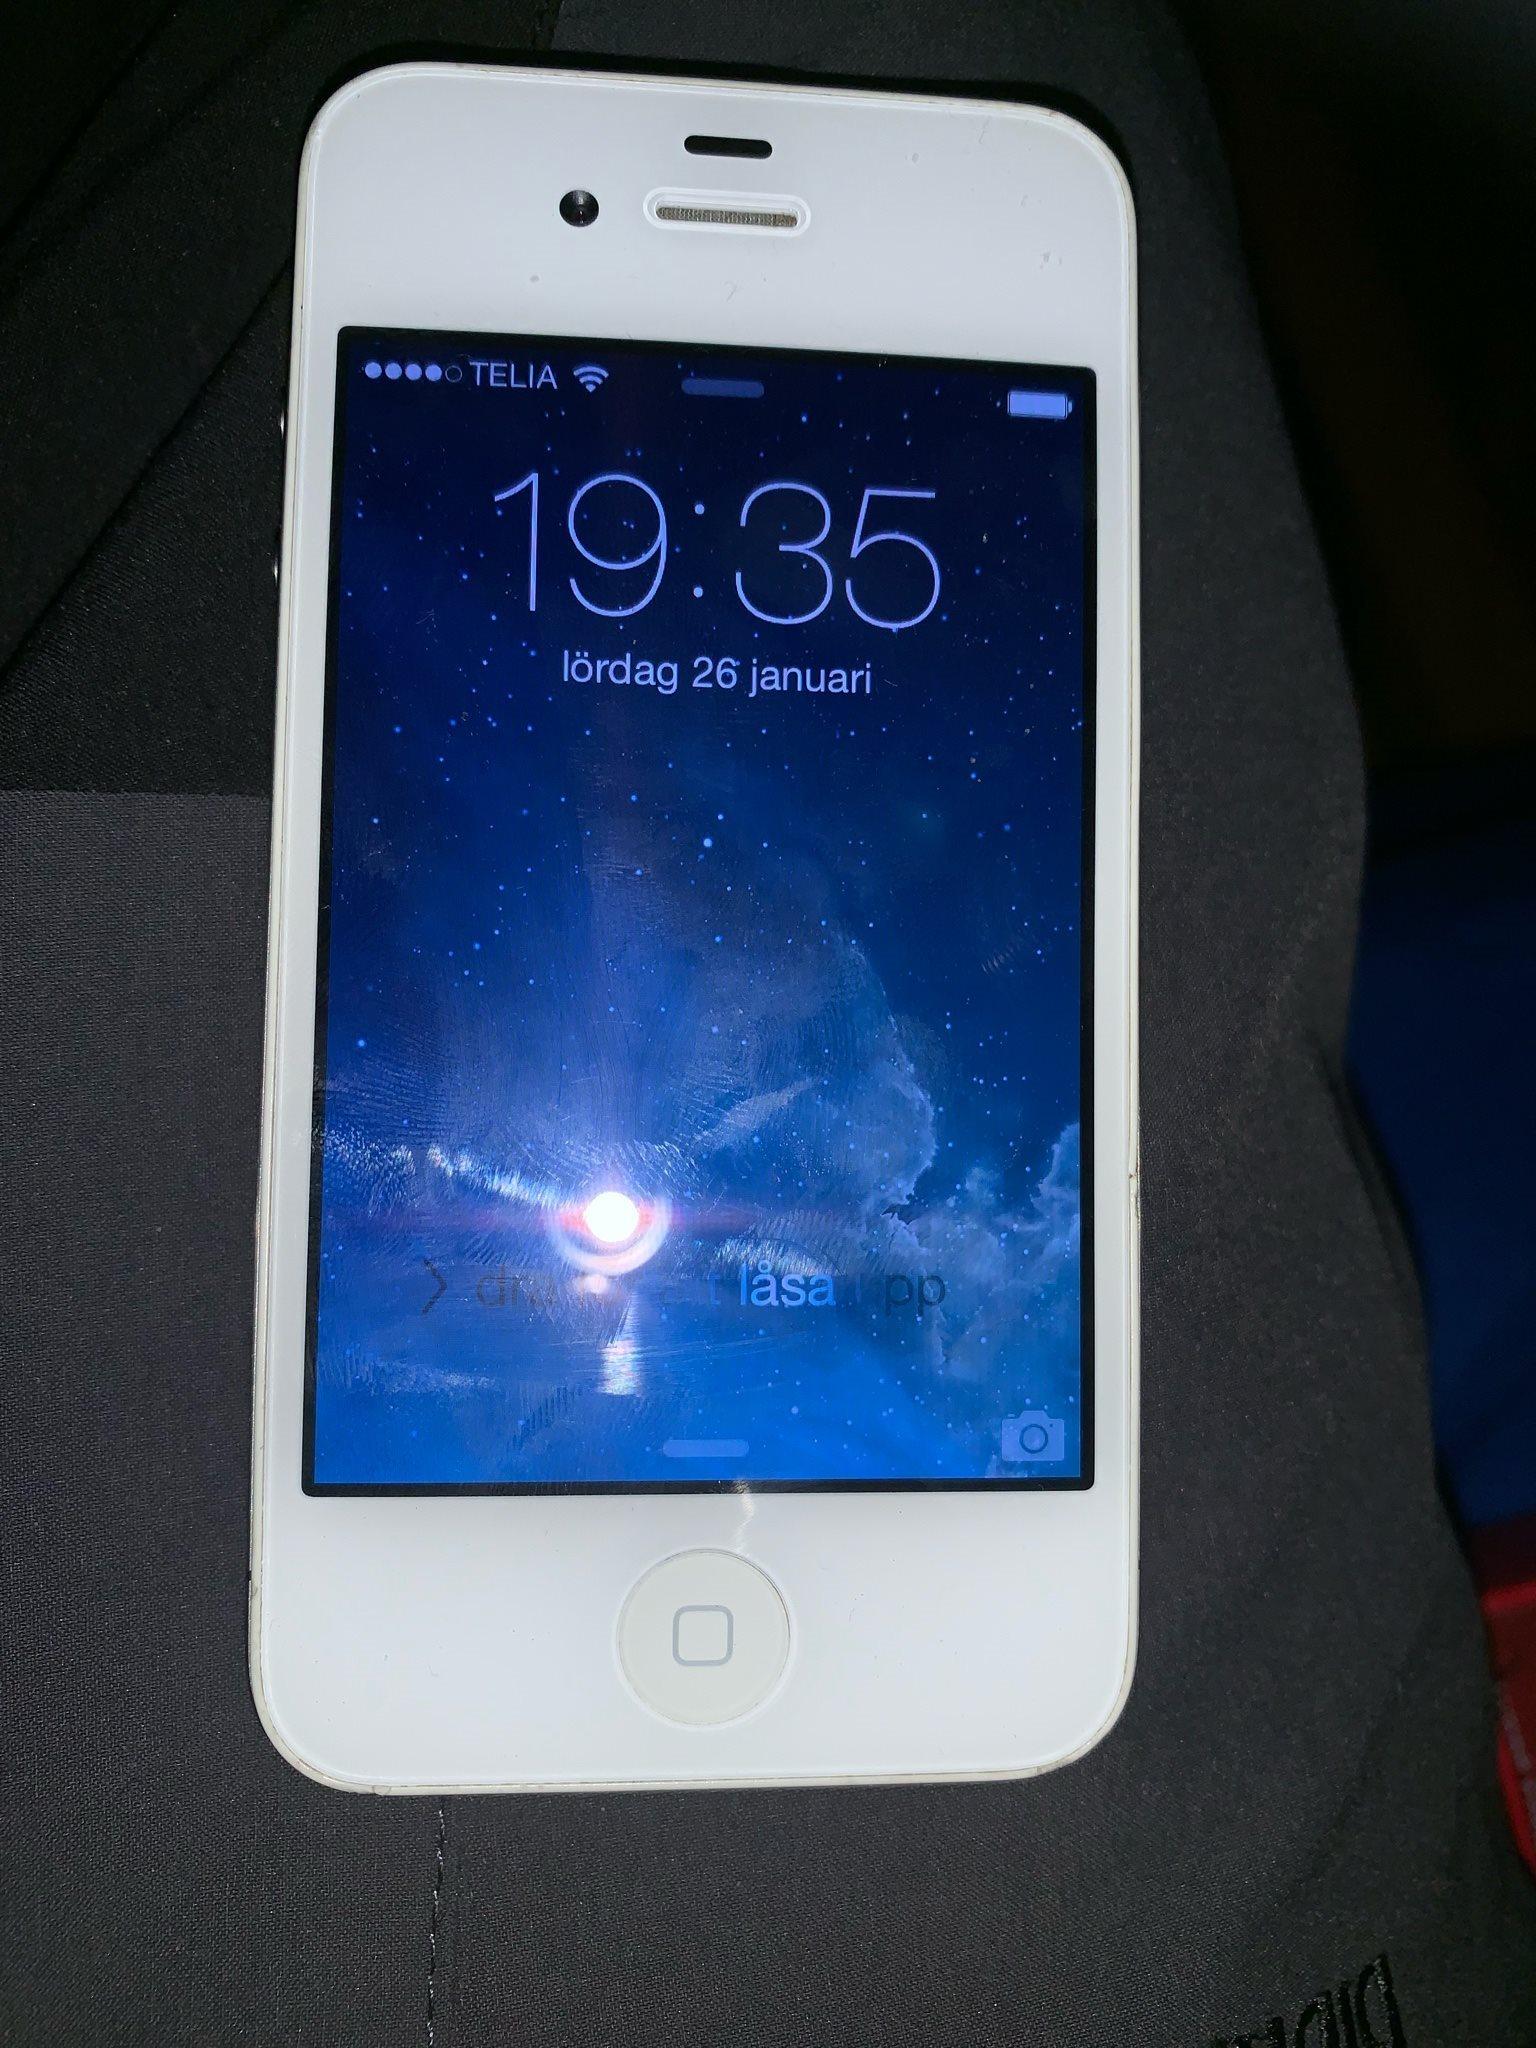 Apple iPhone 4 (Telia) Renoveringsobjekt (337703714) ᐈ Köp på Tradera 41e40cbc8f824